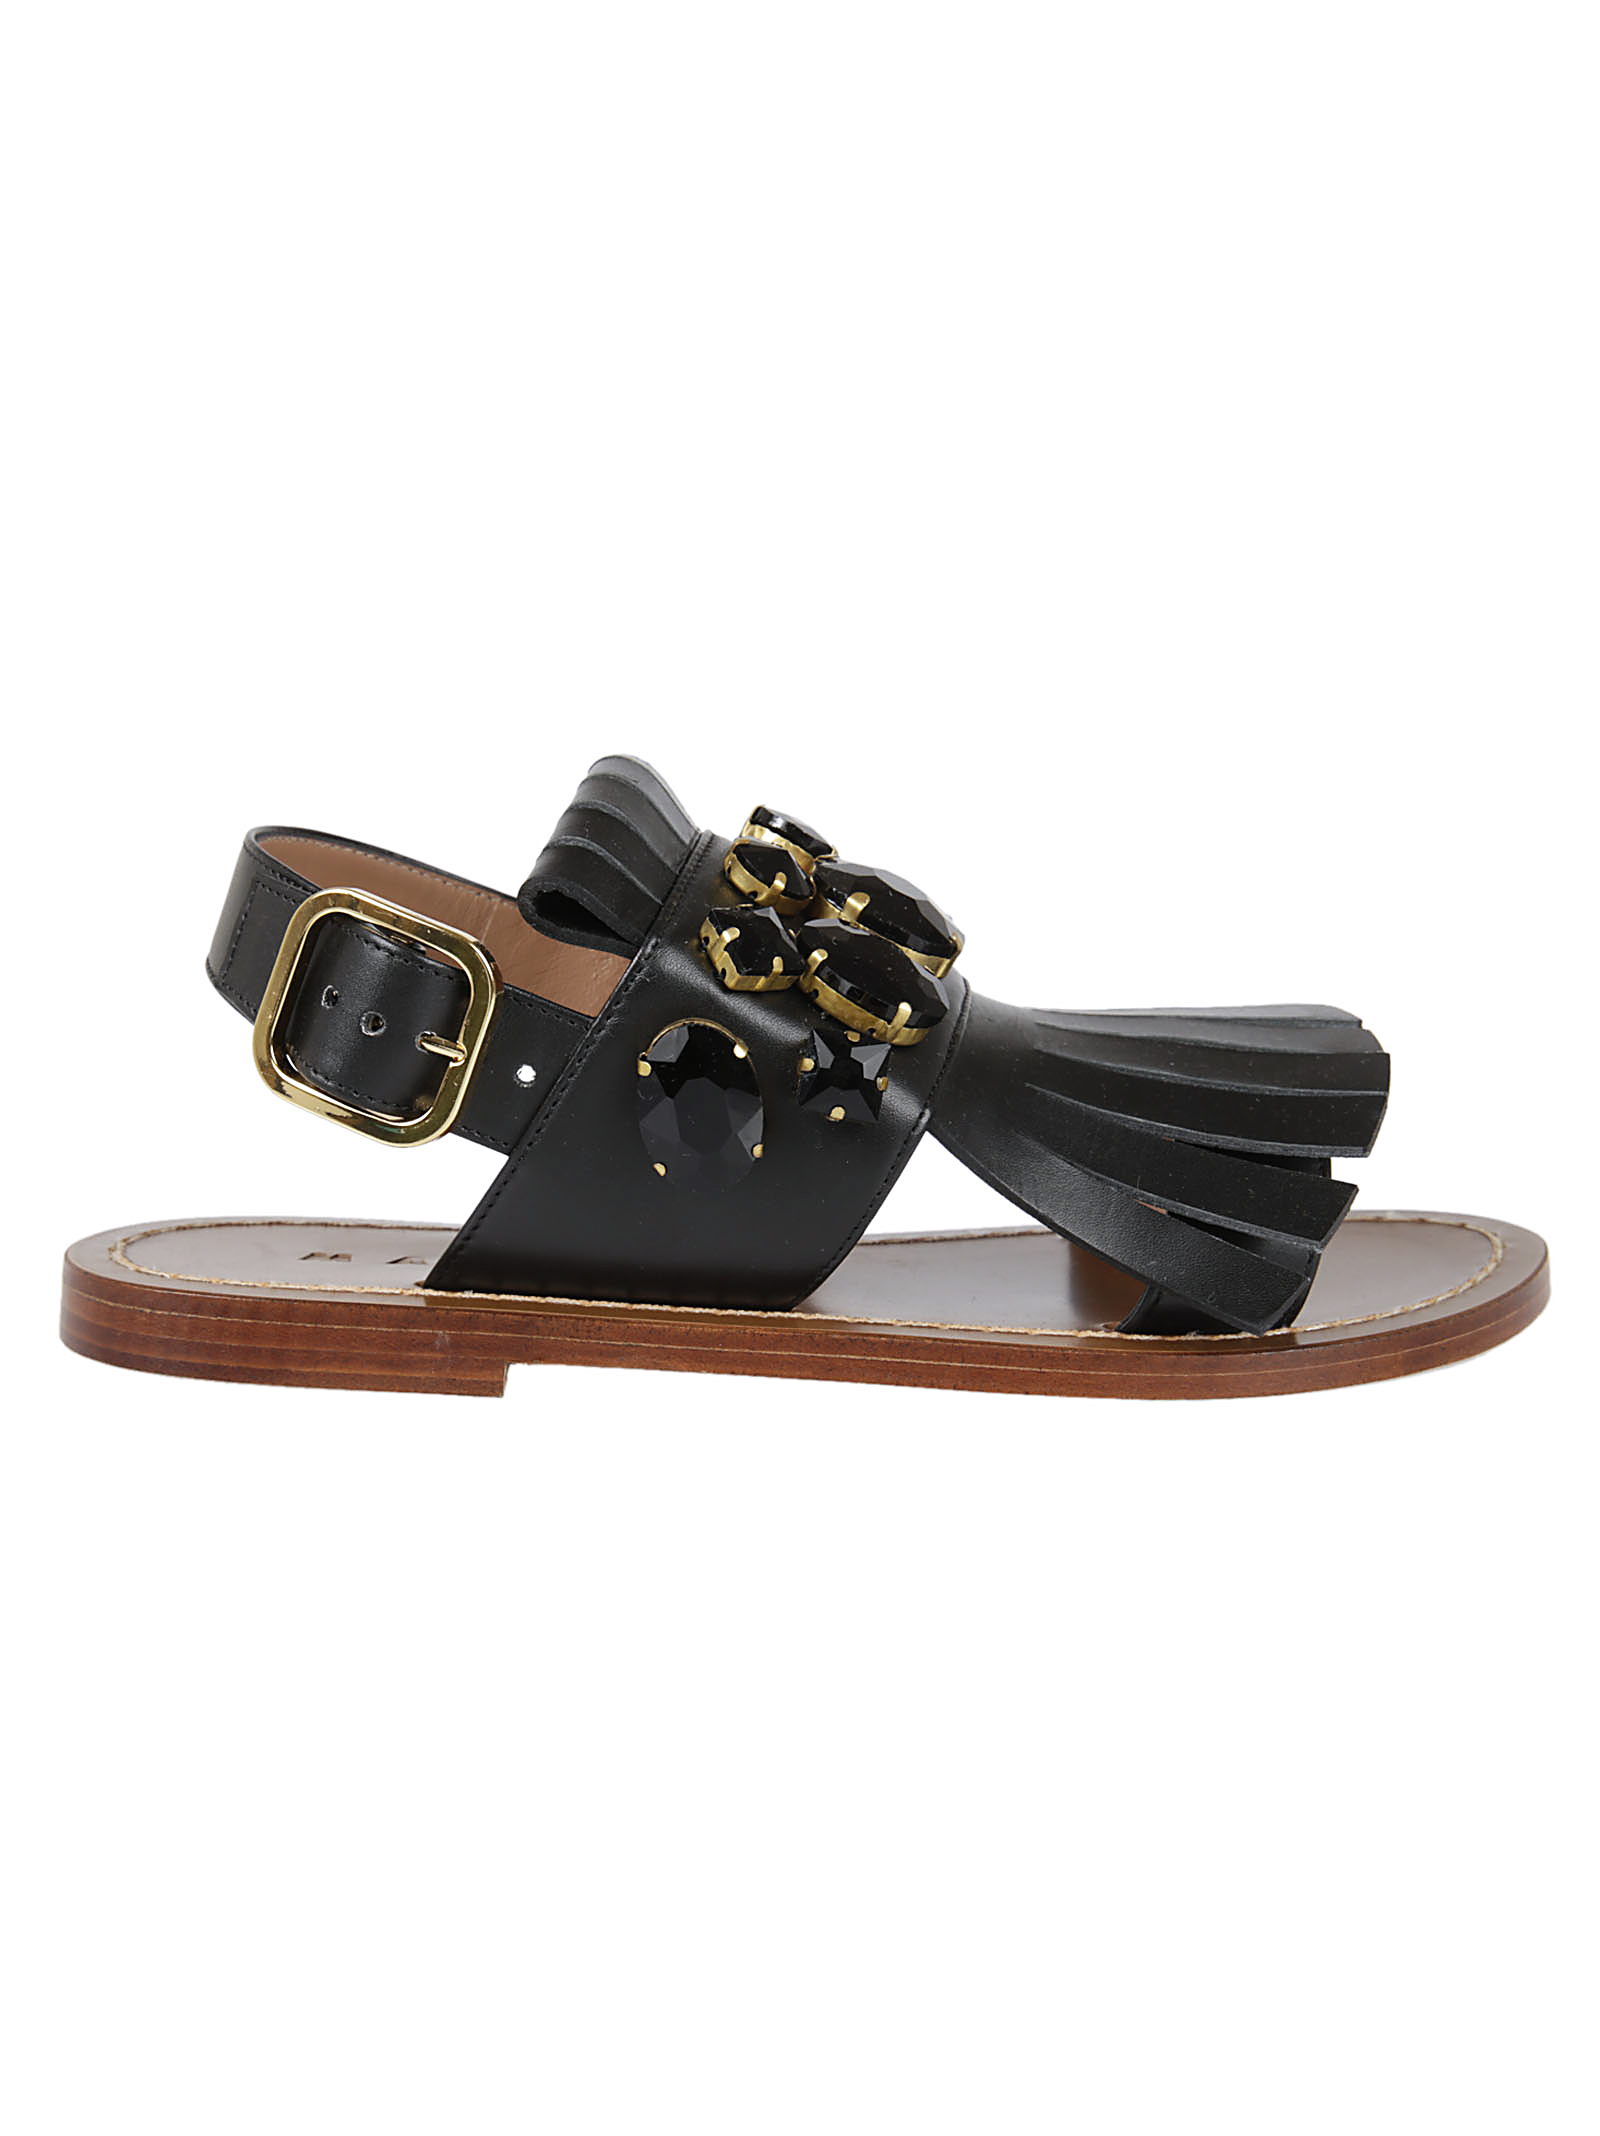 Marni Marni Embellished Flat Sandals